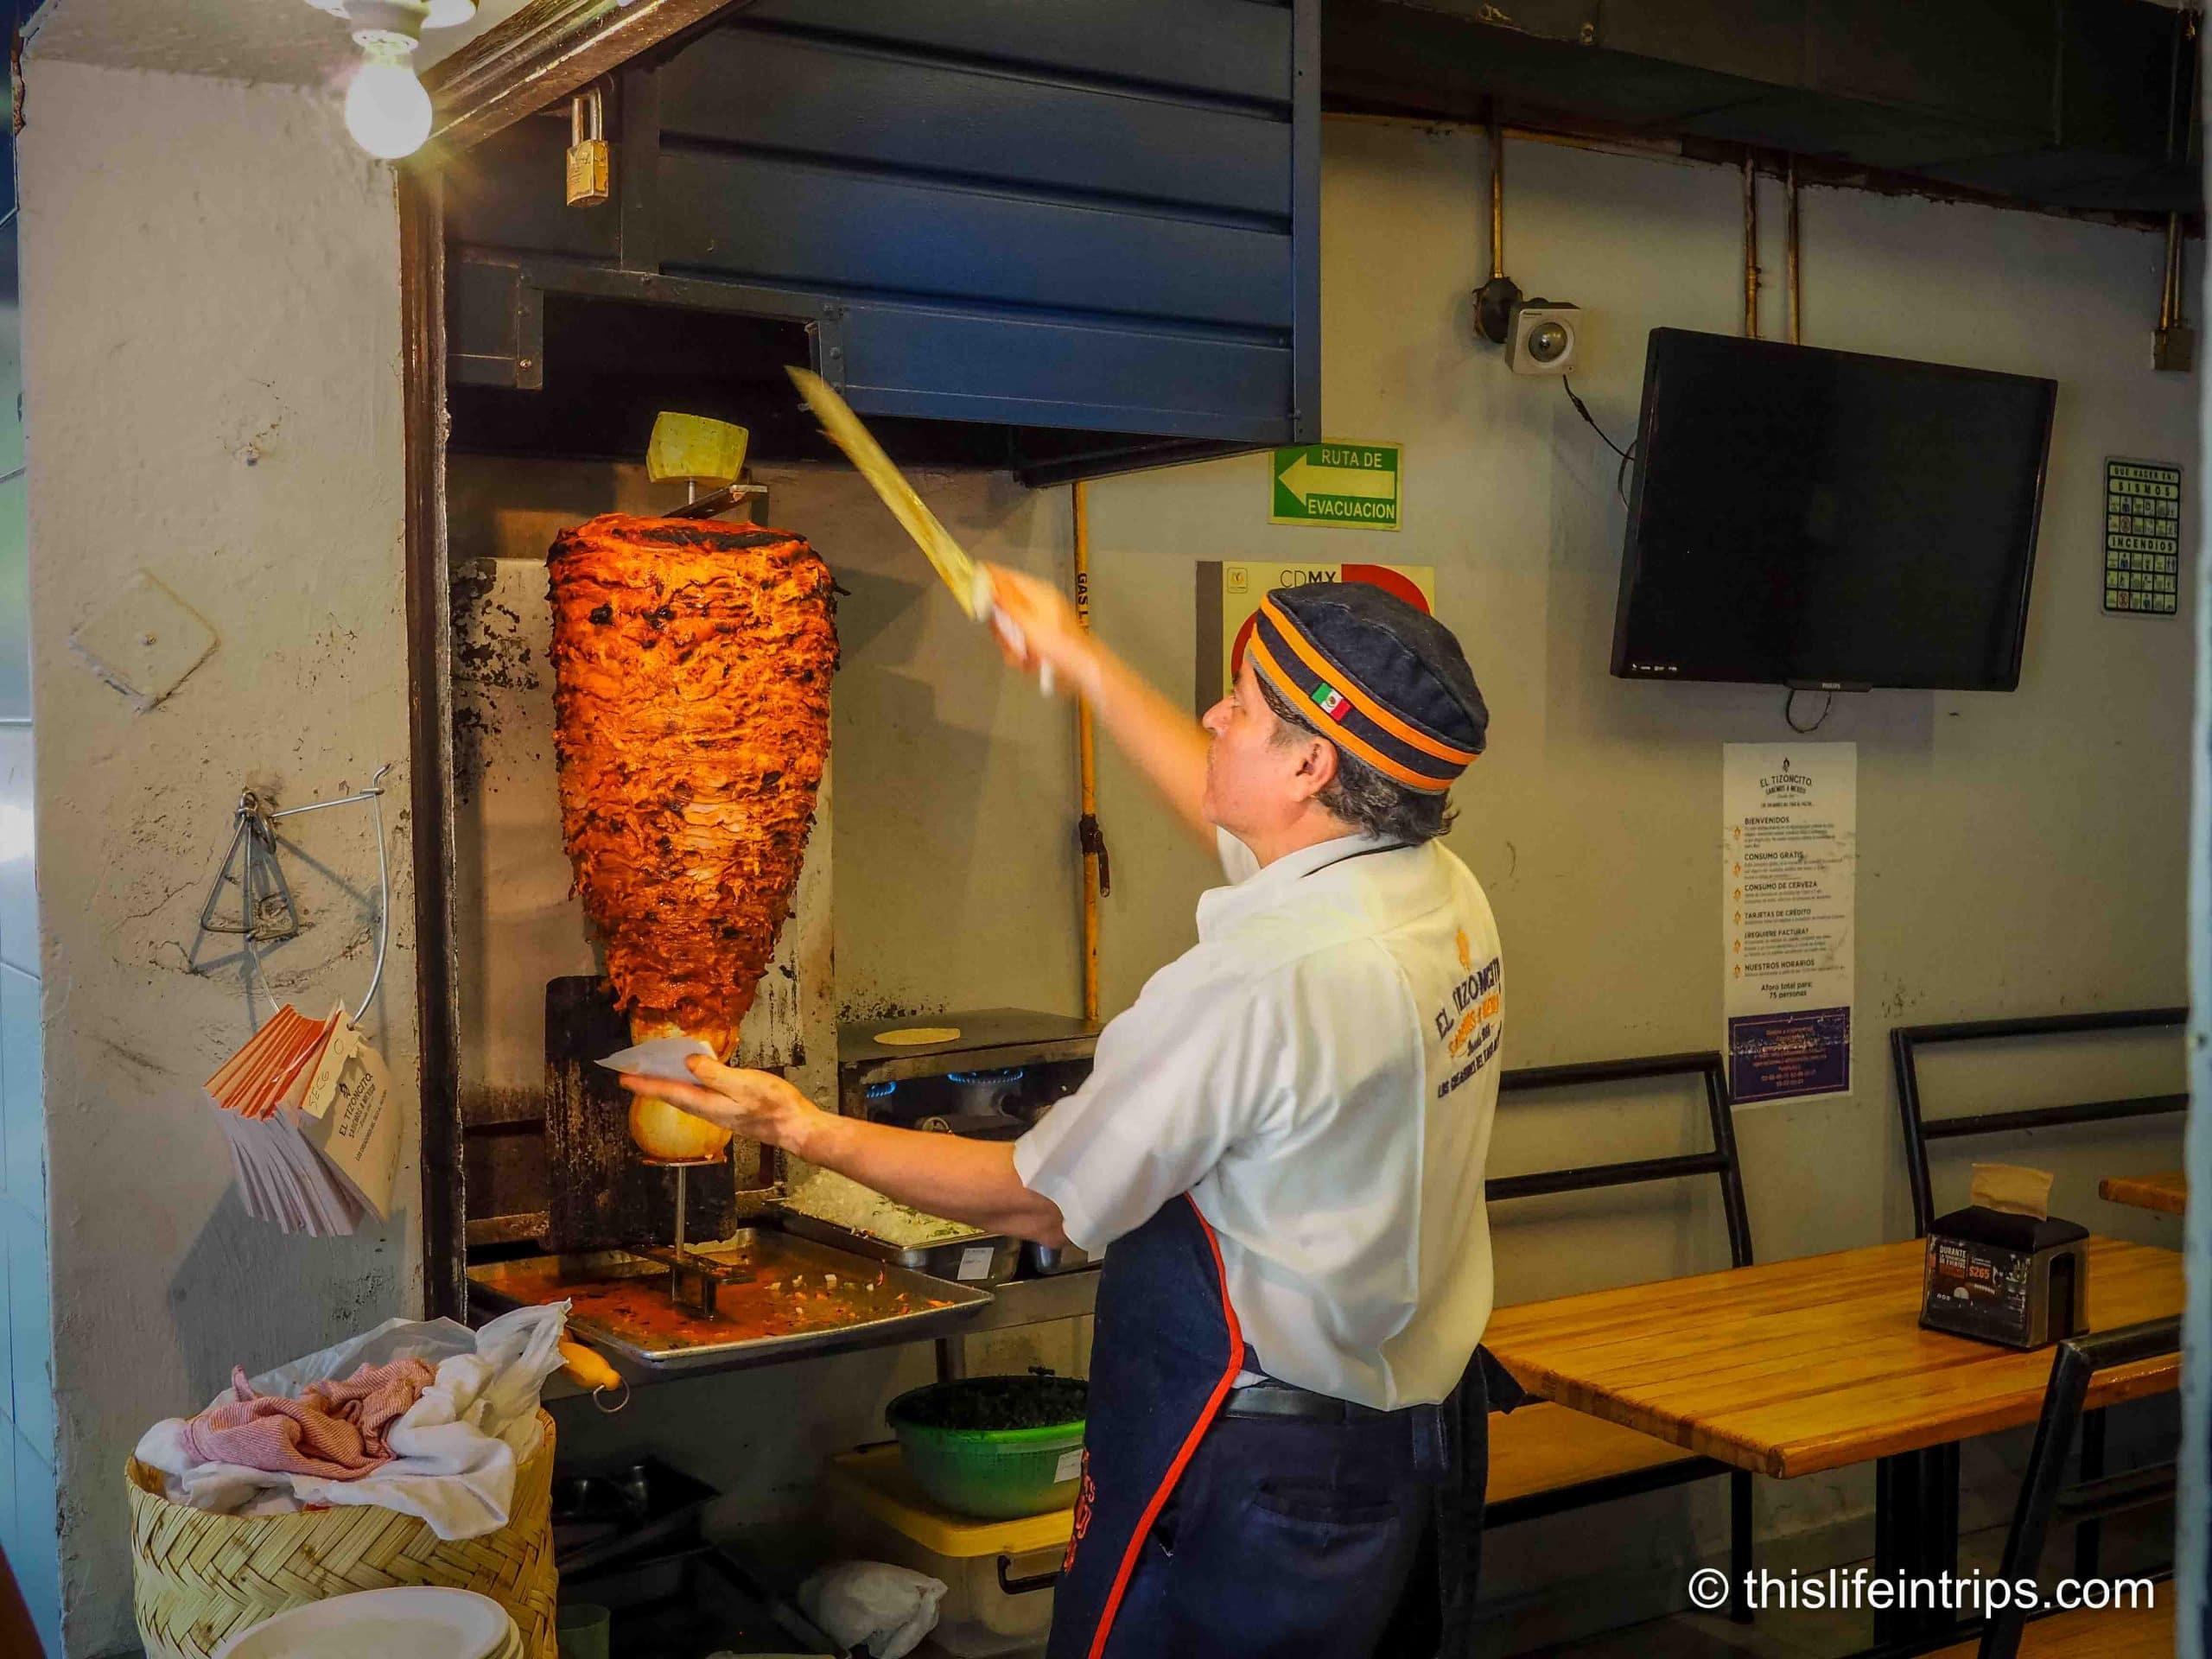 La Condesa Taquerias With Tasty Bites Mexico City Food Tour